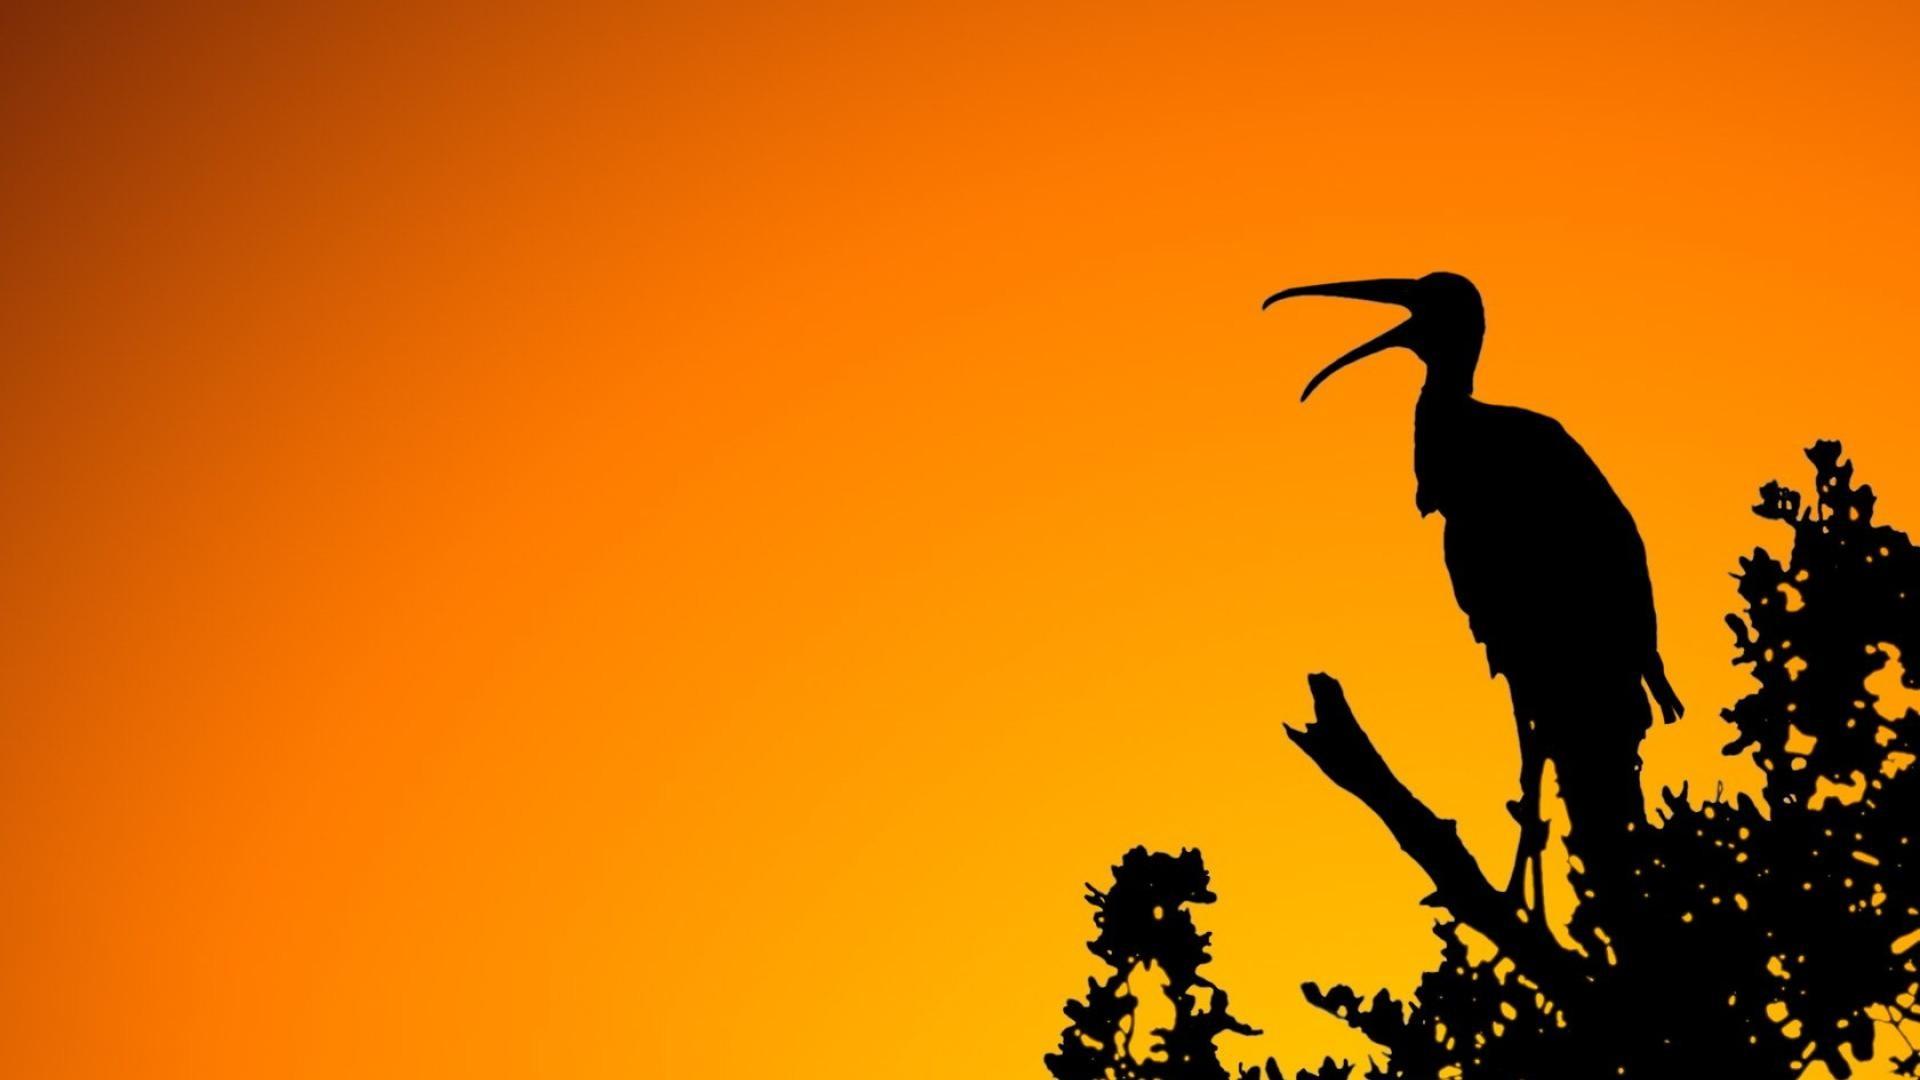 black and orange abstract shadow birds widescreen hd wallpaper . …